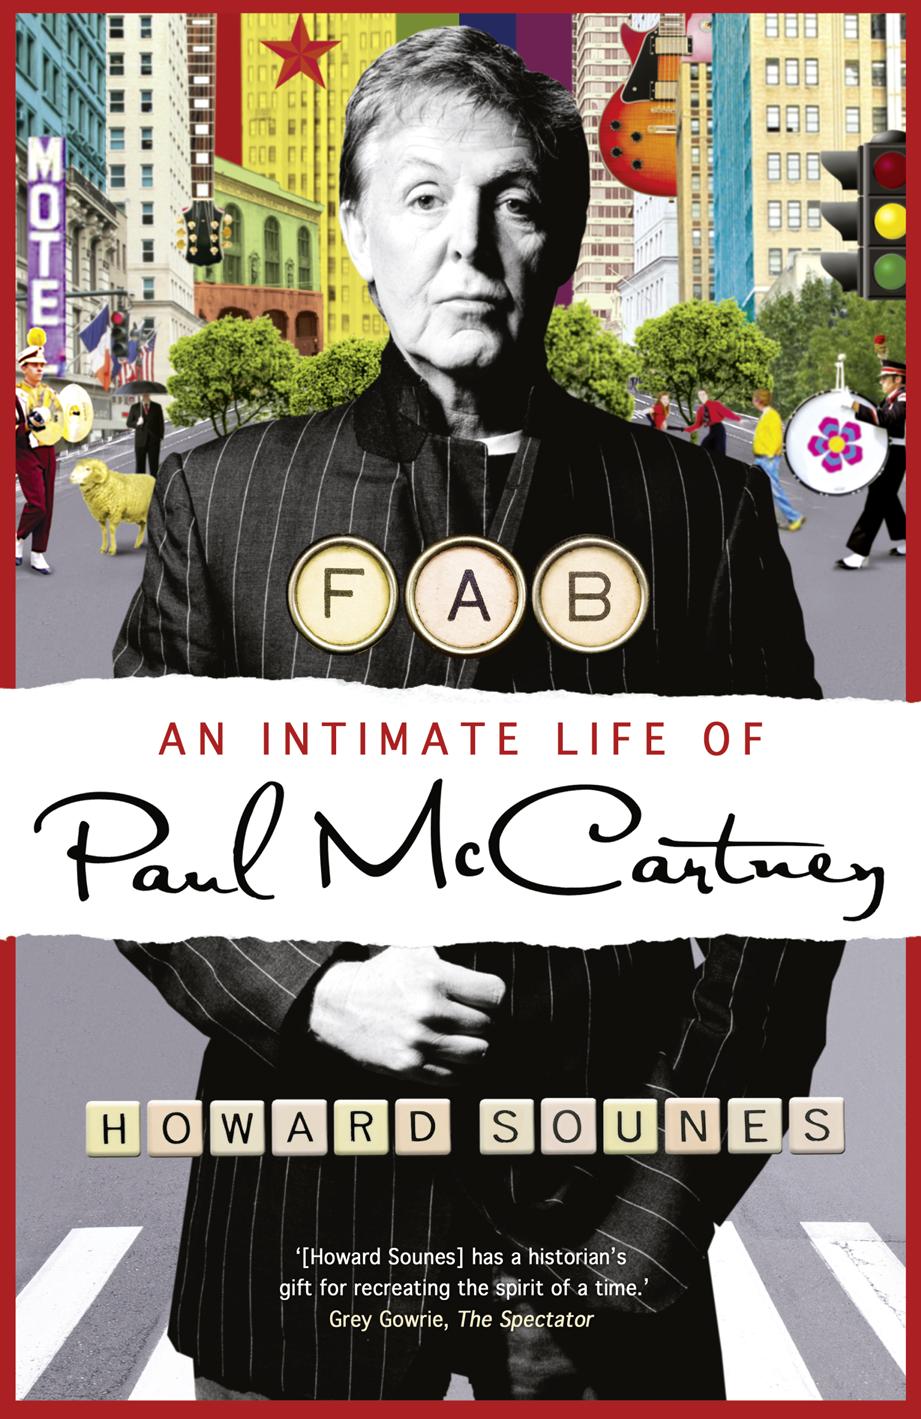 Howard Sounes Fab: An Intimate Life of Paul McCartney